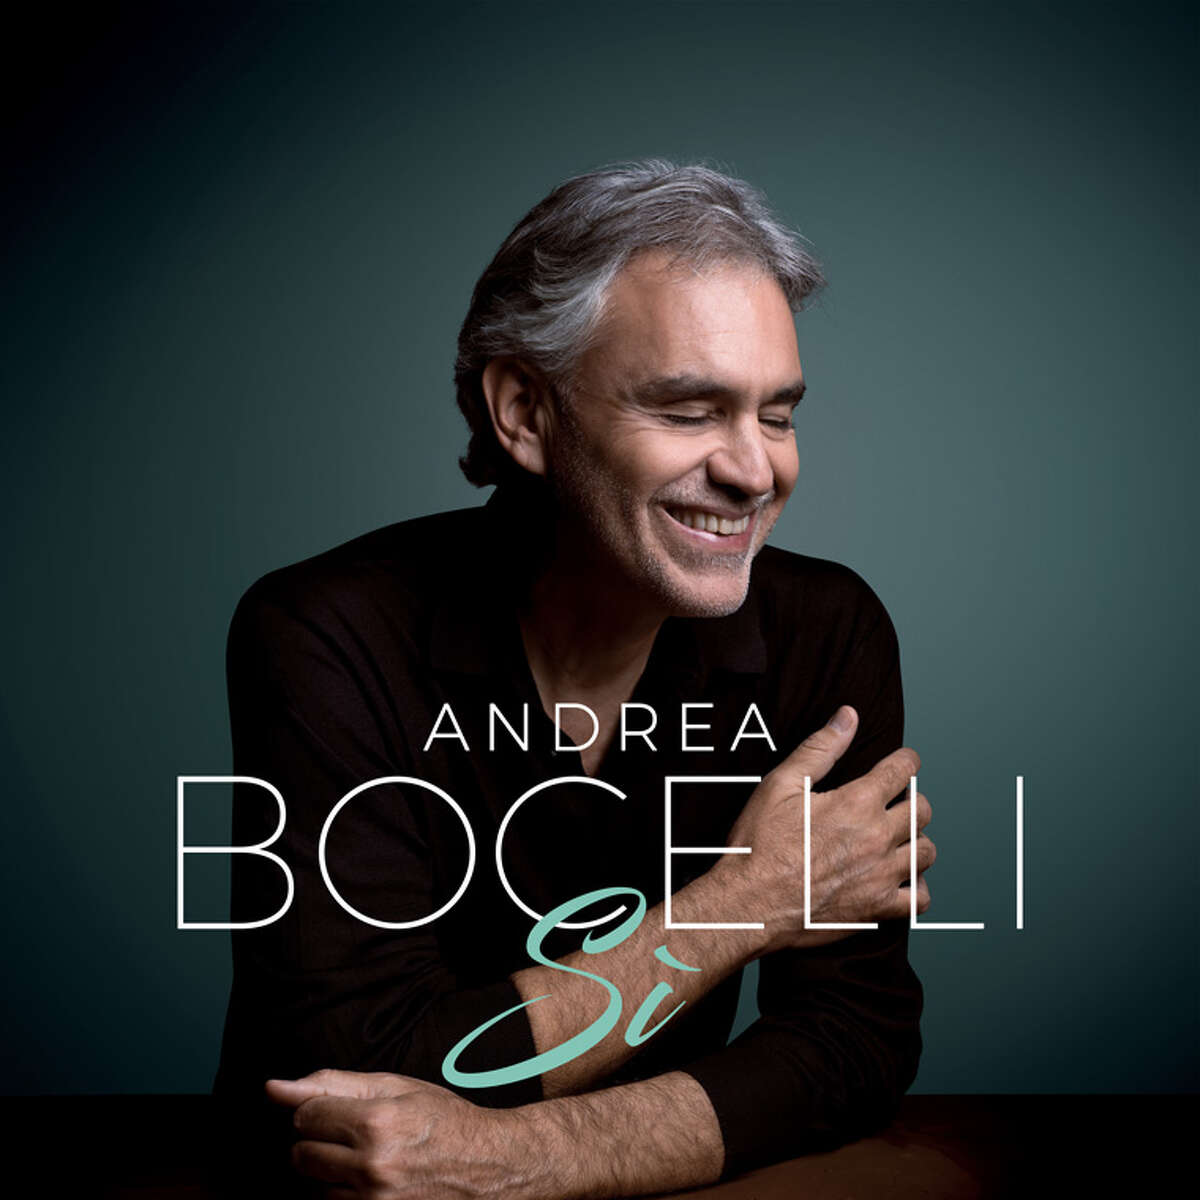 Andrea Bocelli performs at Enterprise Center October 17.